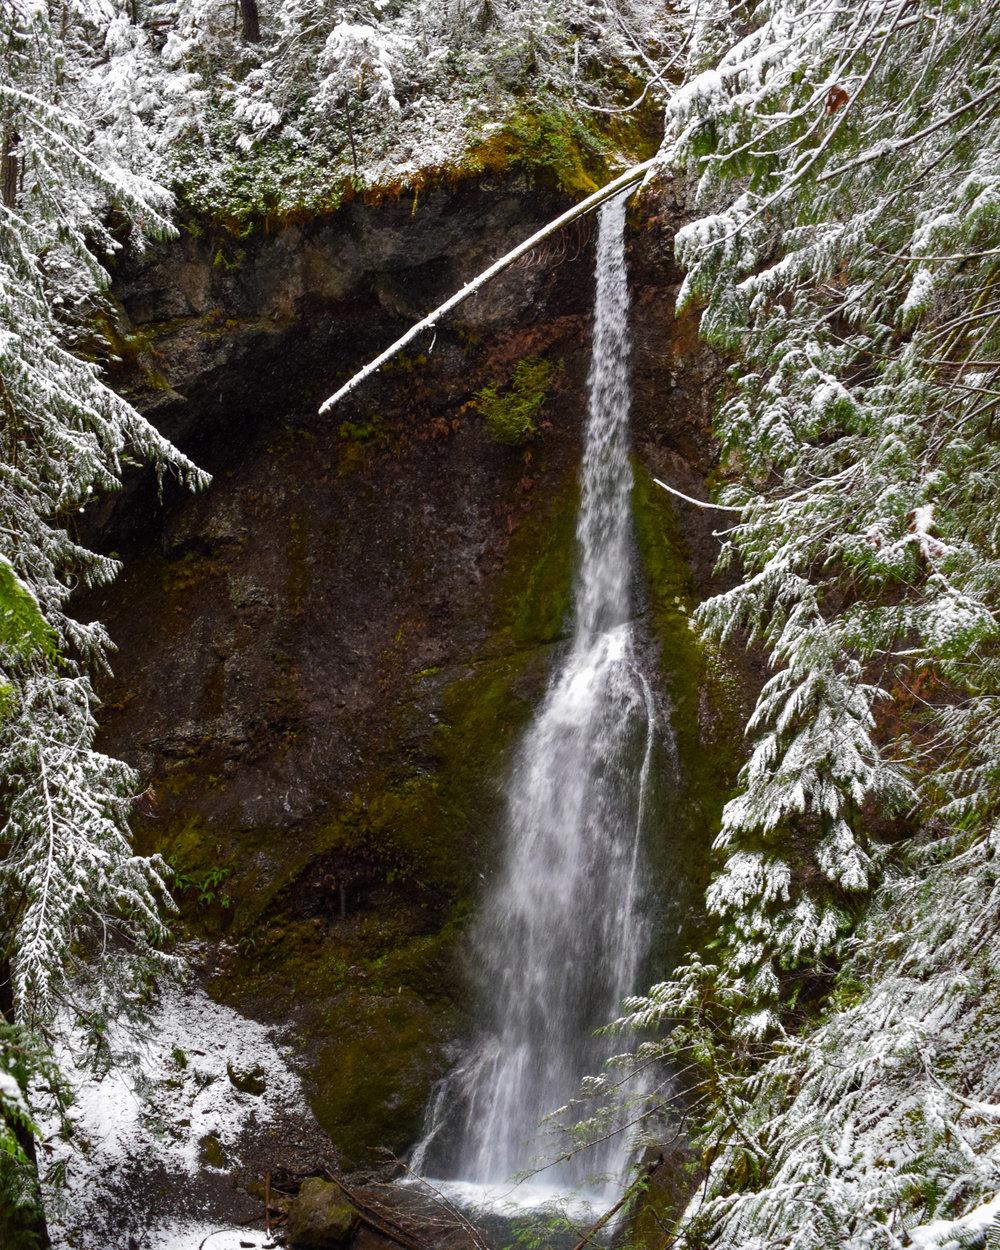 Winter Snow Surrounding the Falls